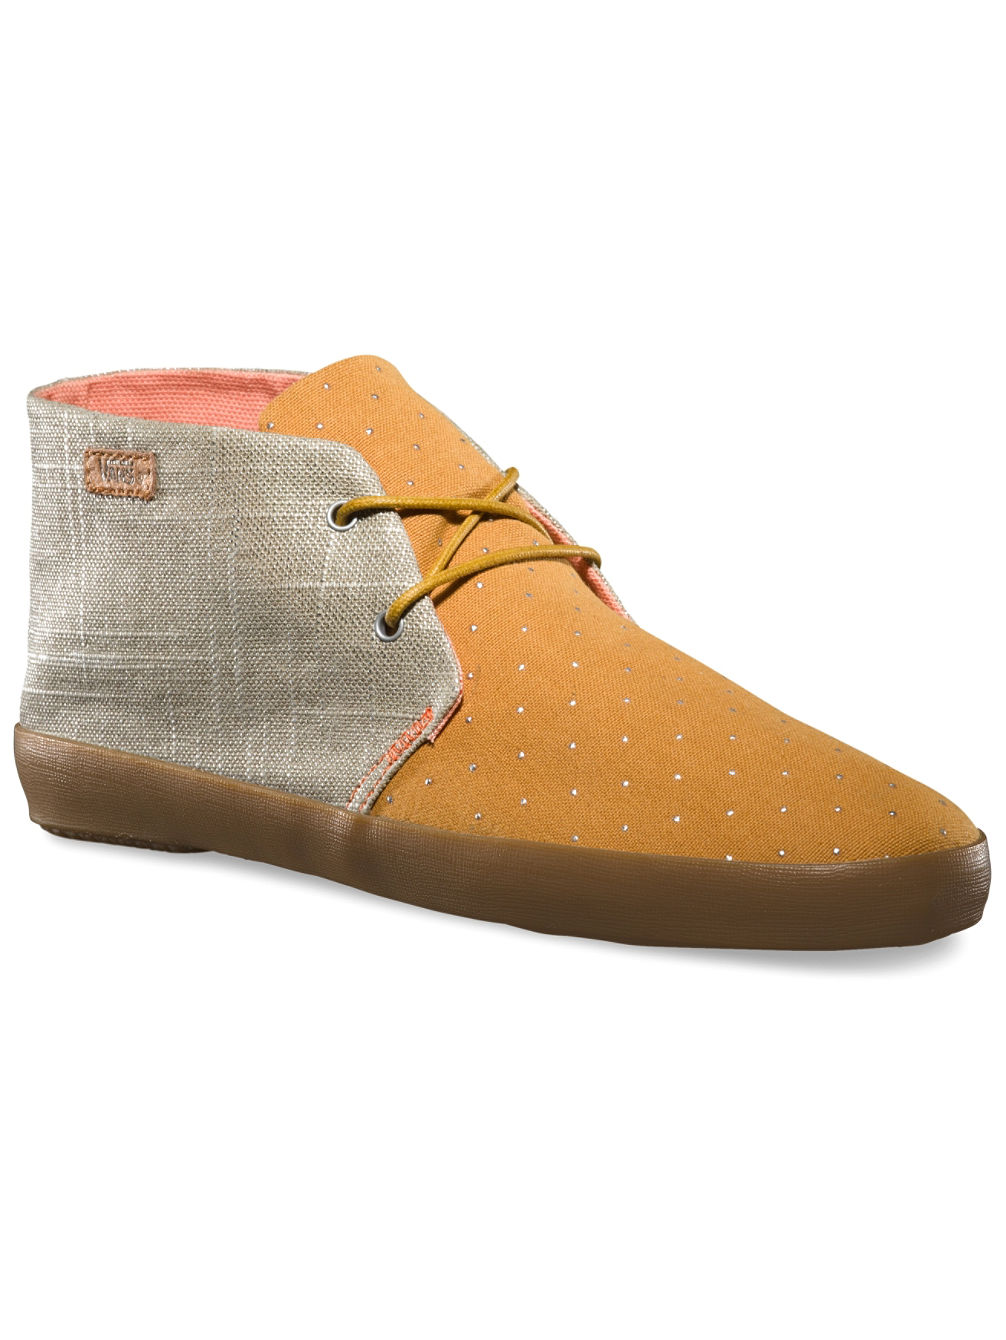 Vans Rhea Sneakers Women